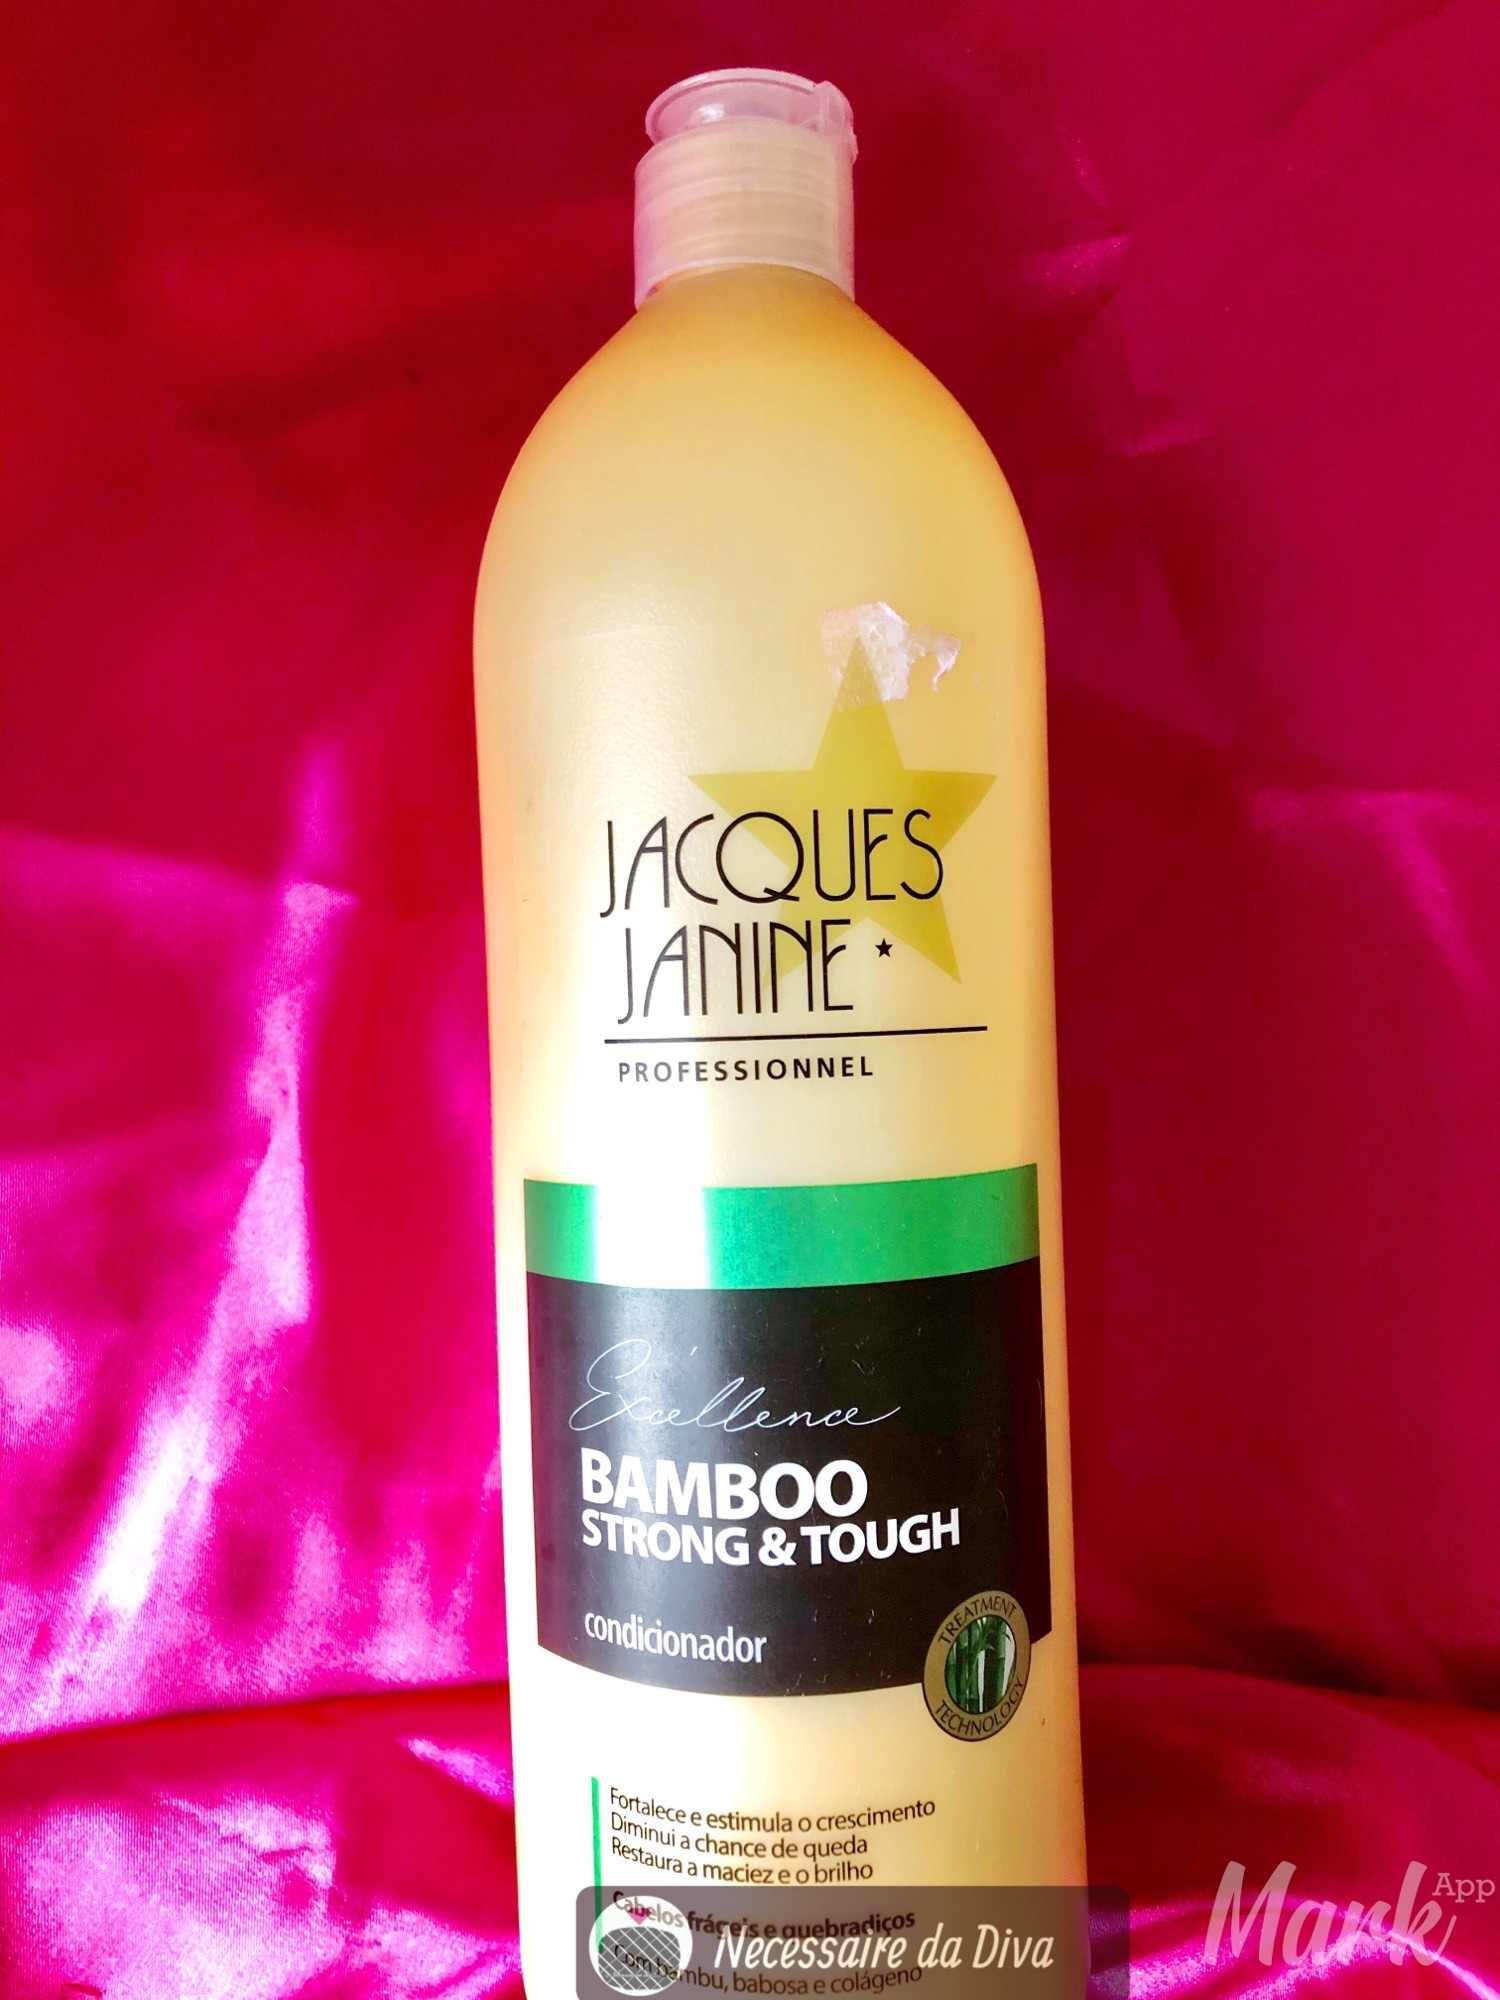 shampoo jacques janine bamboo,